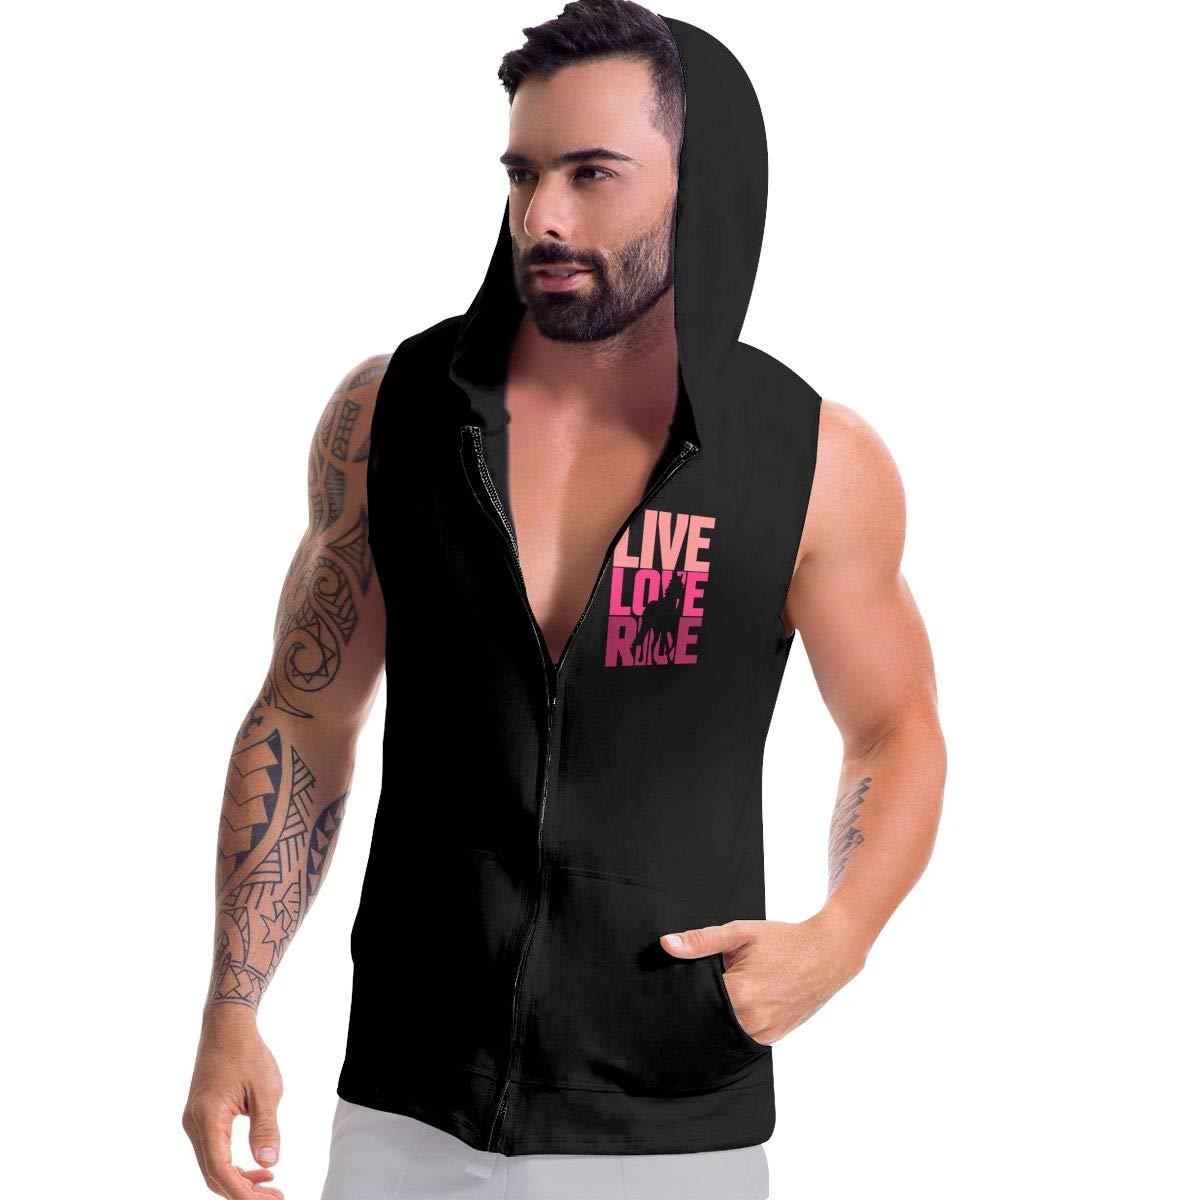 Live Ride Horse Zip Up Vest Love Mens Sleeveless Sweatshirt Hoodies